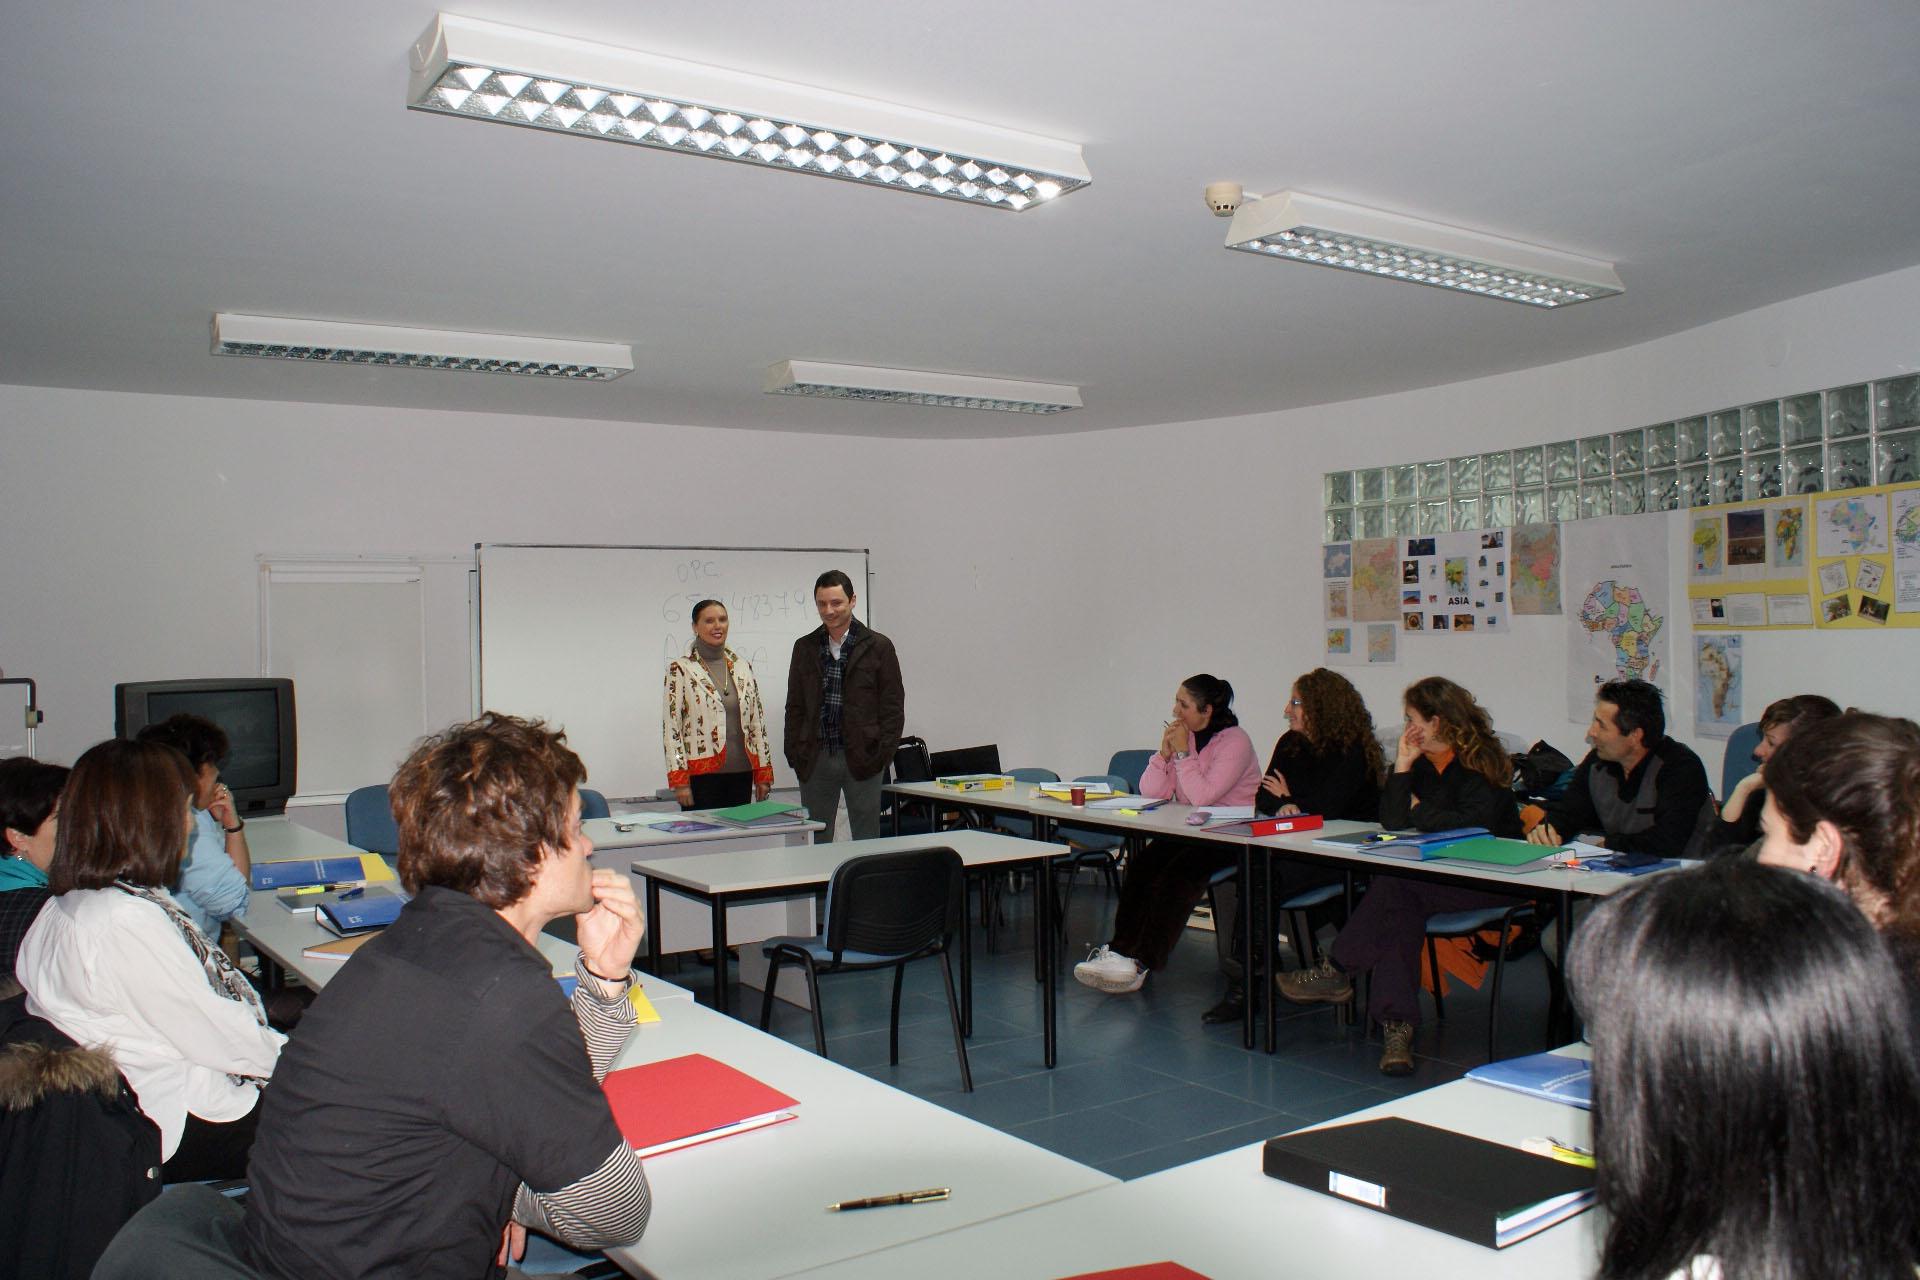 Comienza el curso de promoci n tur stica e informaci n for Oficina virtual economica